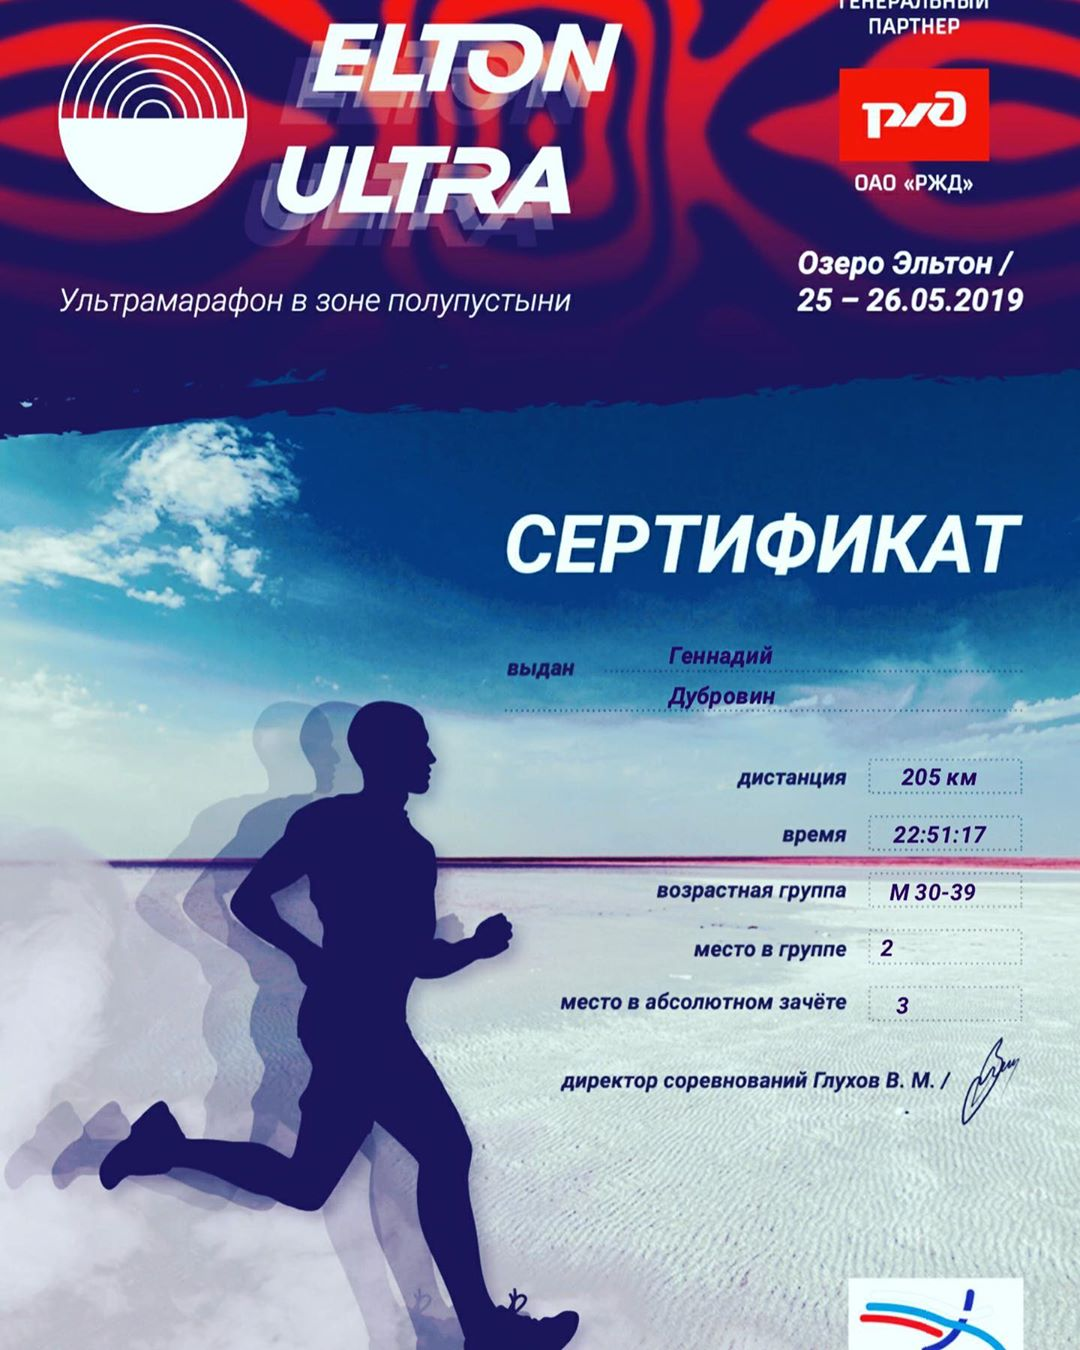 Сертификат победителя Геннадия Дубровина SKI 76 TEAM. Ультрамарафон Эльтон Ультра 2019